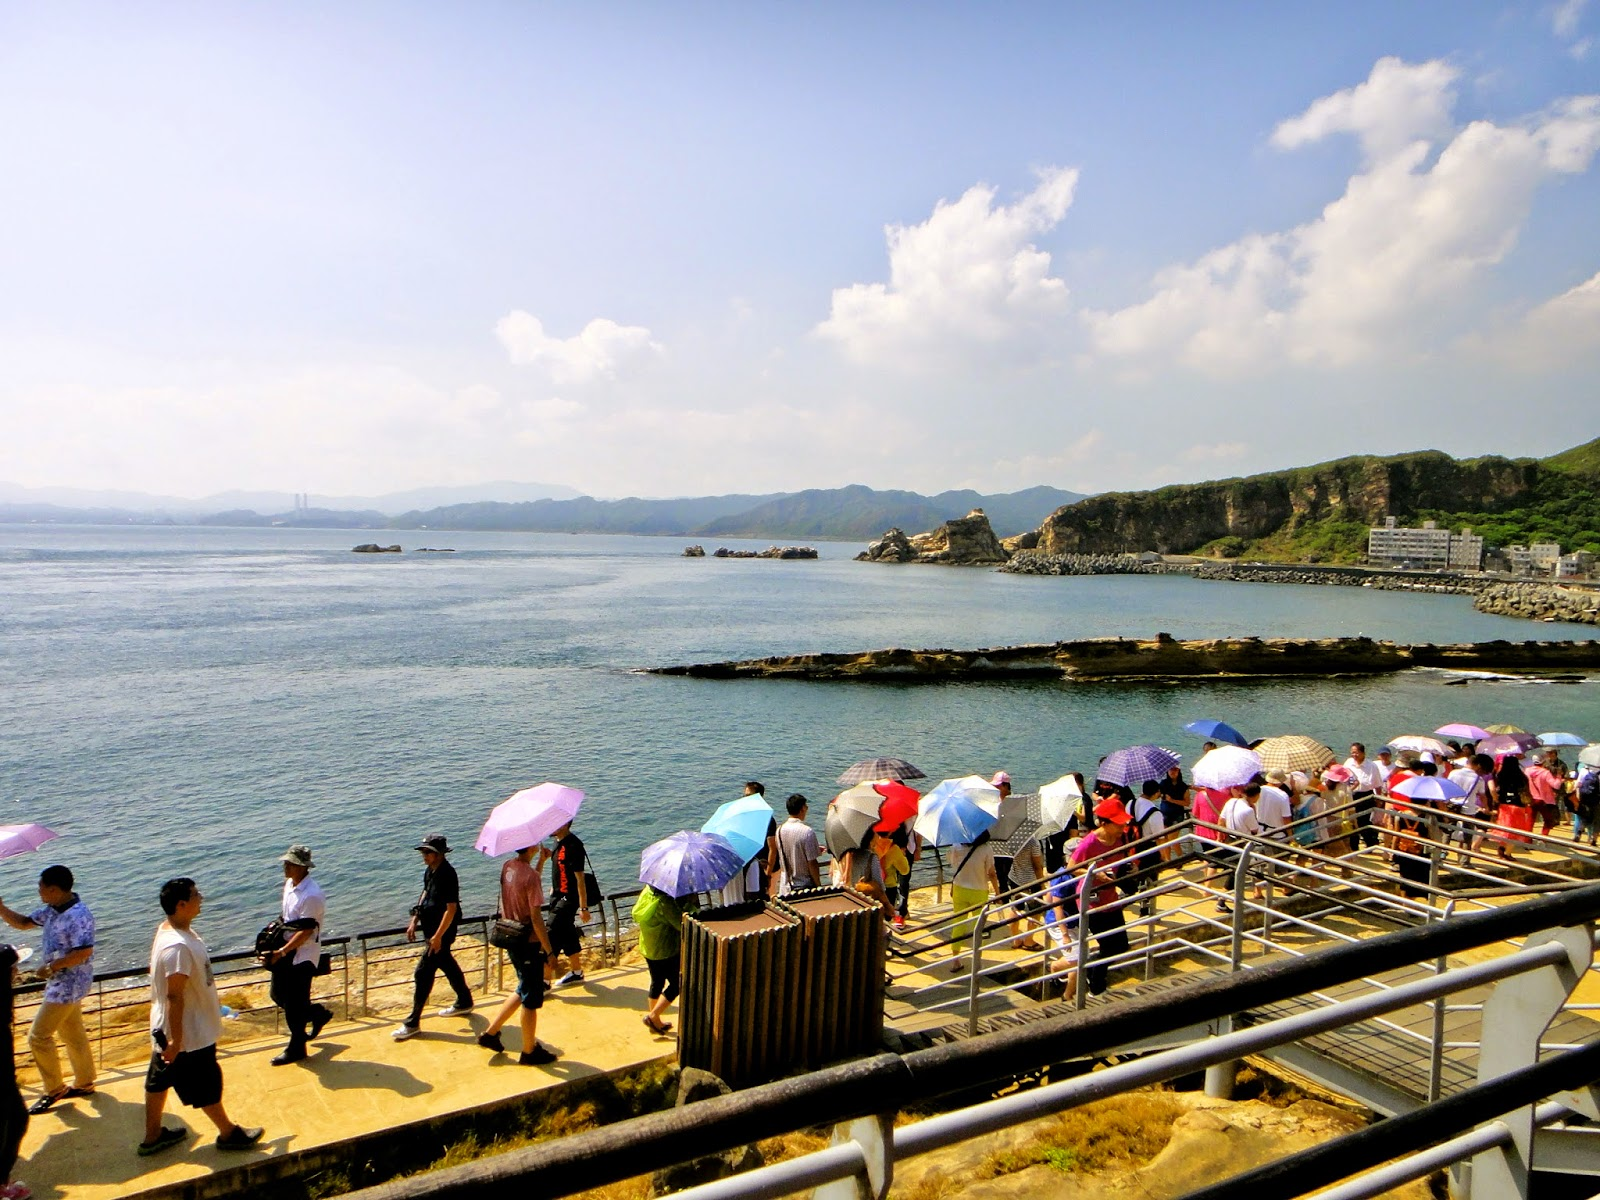 Yehliu Coastline View in Taiwan